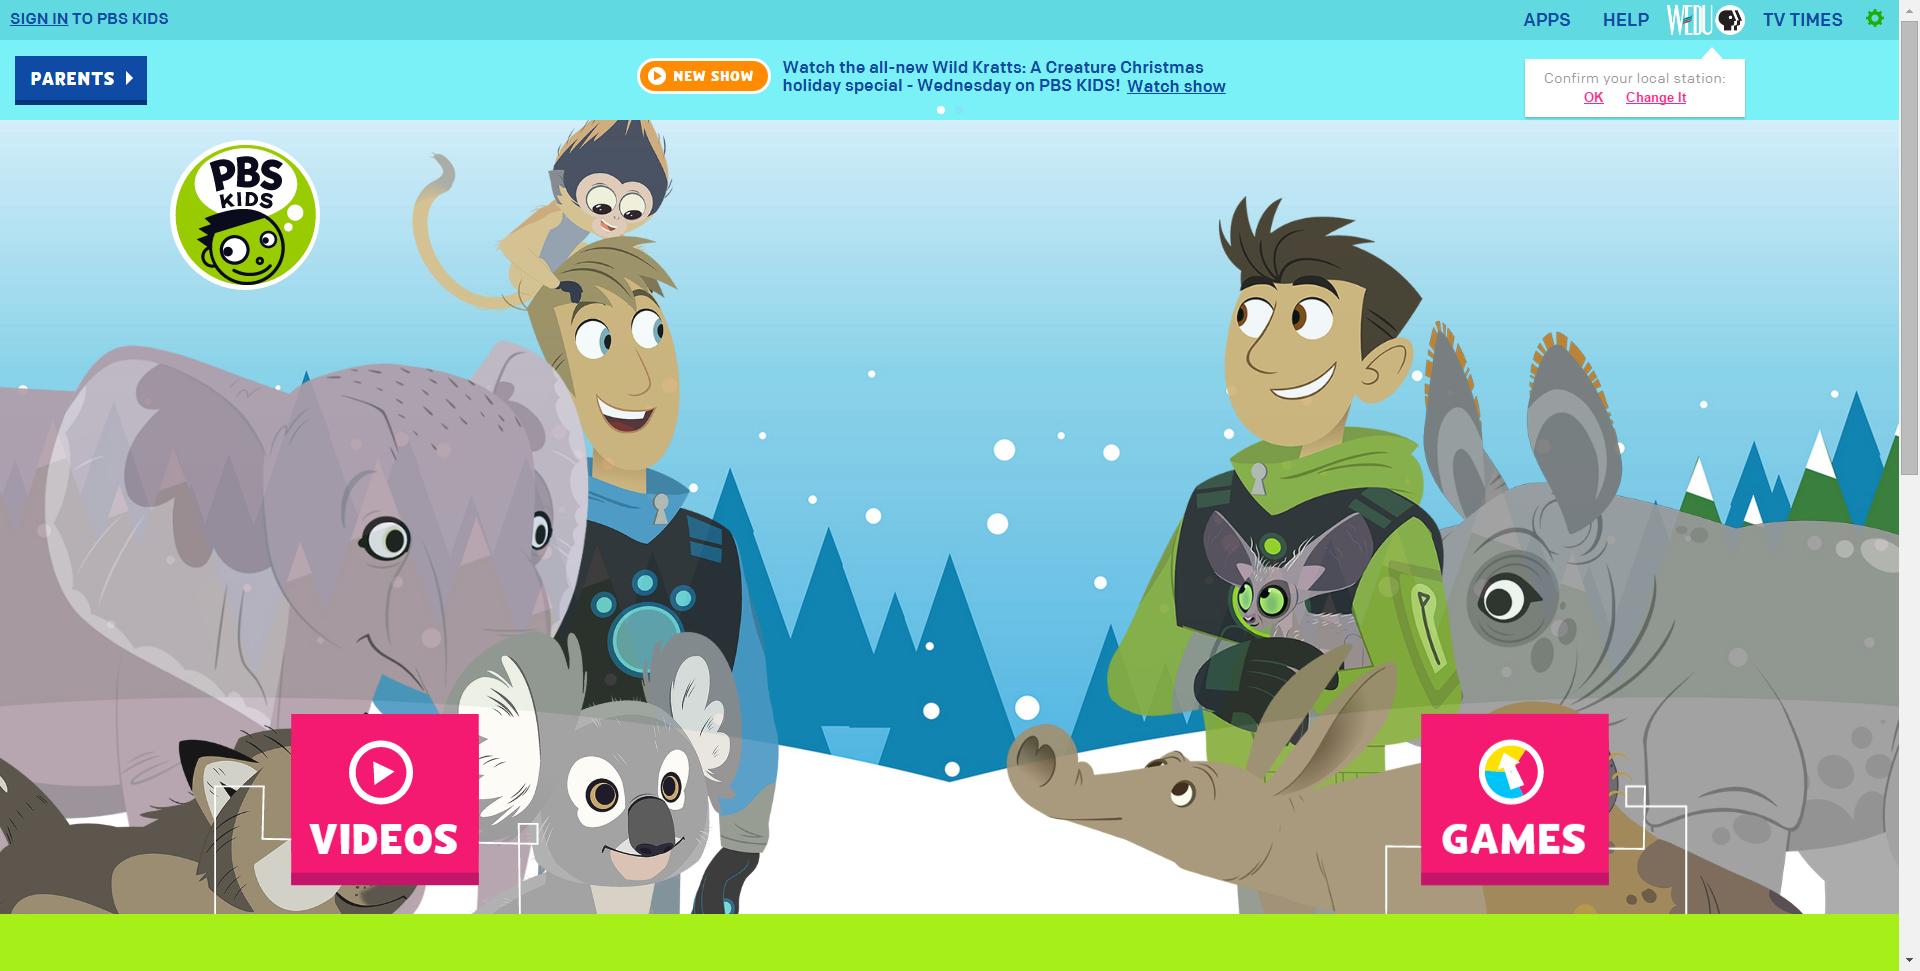 PBS KIDS Pbs kids, Kids shows, Educational games